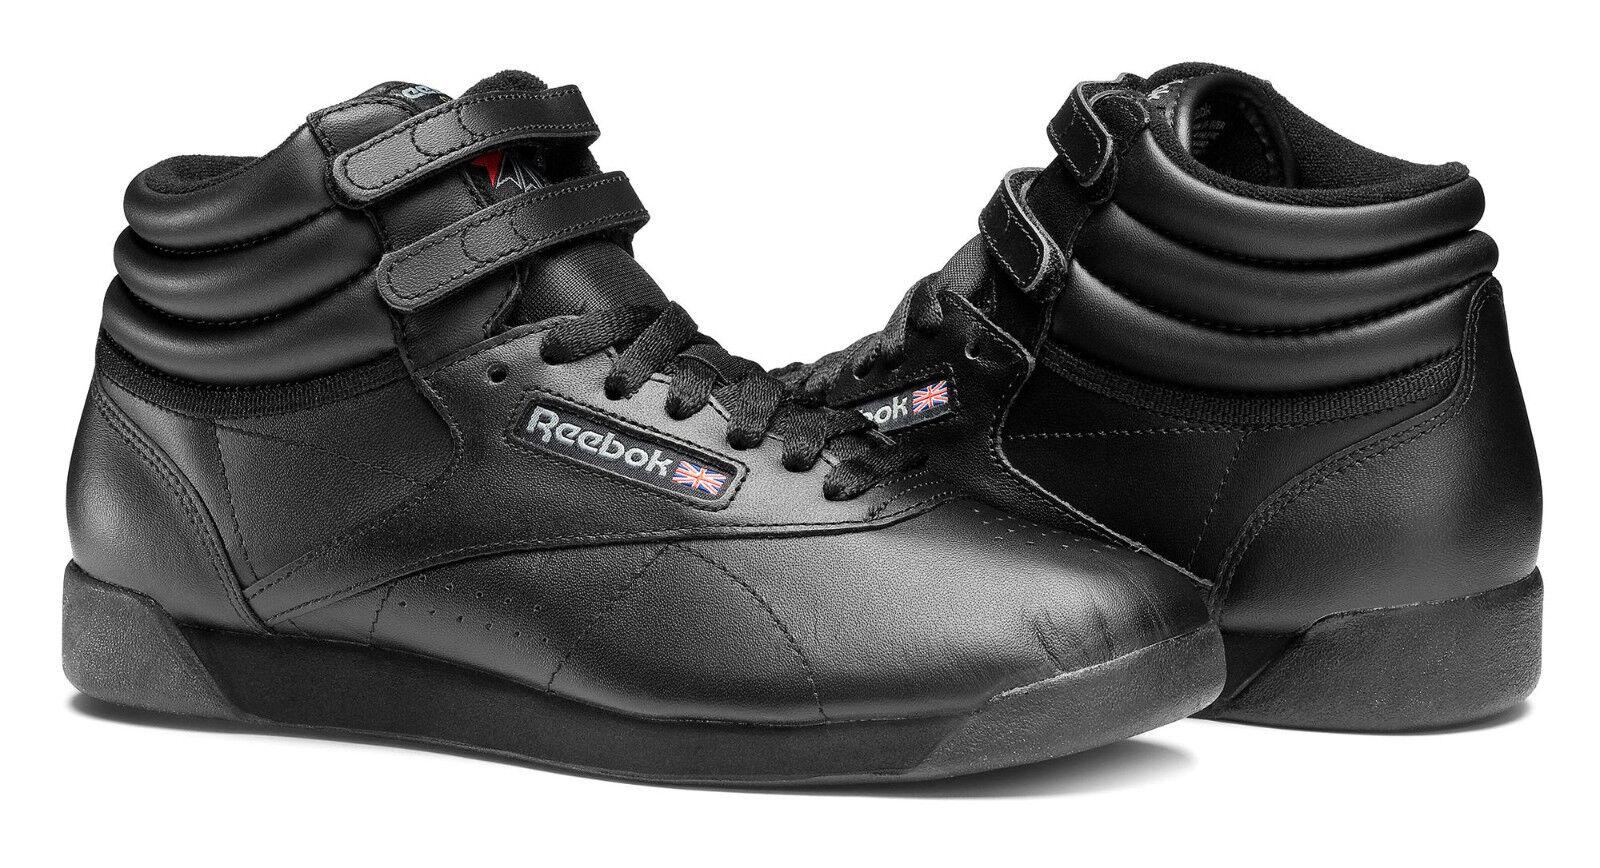 Reebok Hi Freestyle Noir Femmes Baskets Chaussures de Tennis Article 71